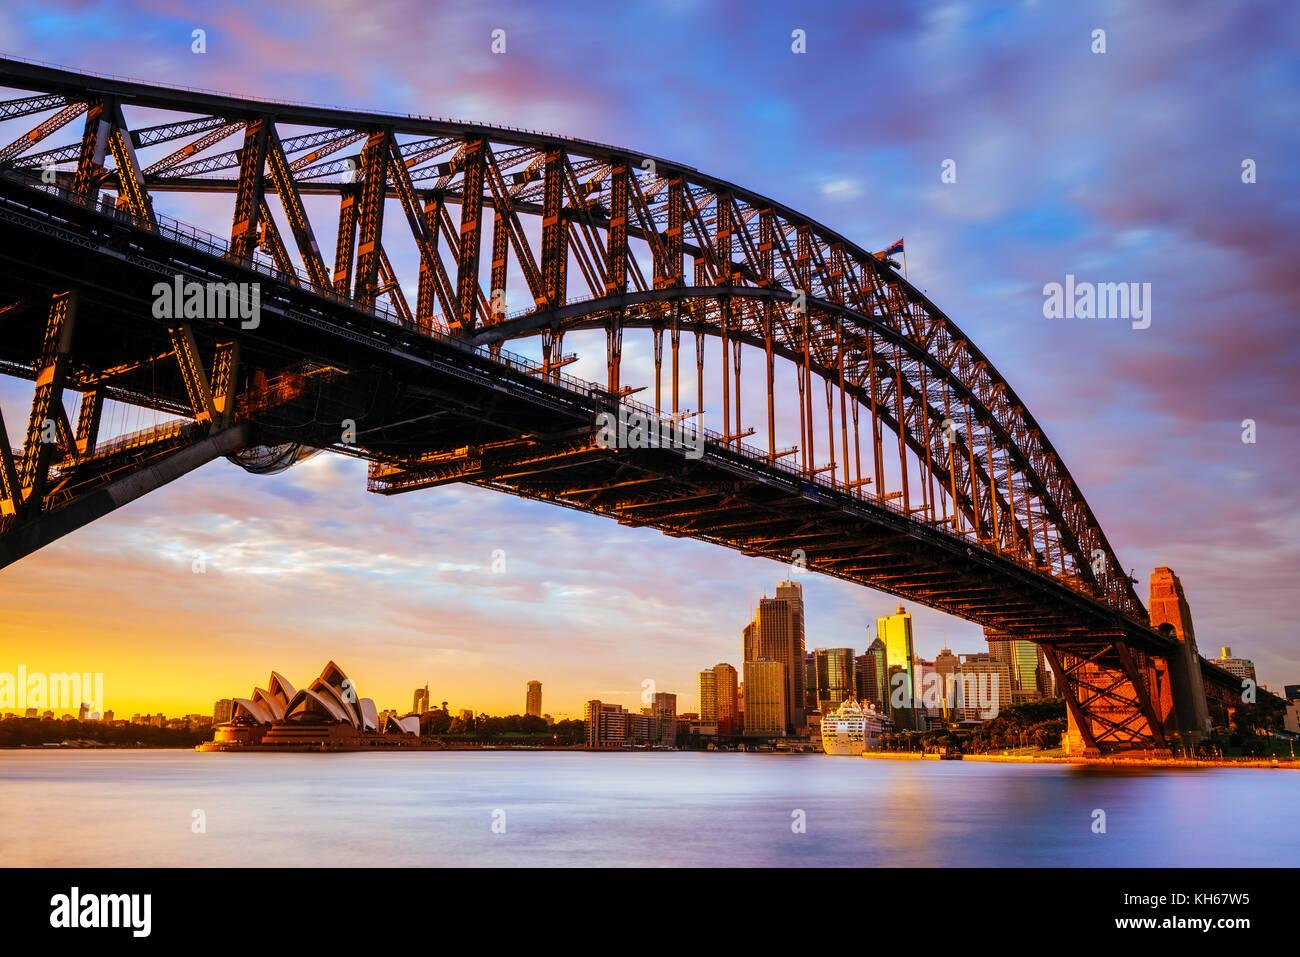 Amanecer en el Harbour Bridge y la Ópera de Sydney, Milsons Point, Sydney, New South Wales, Australia Foto de stock